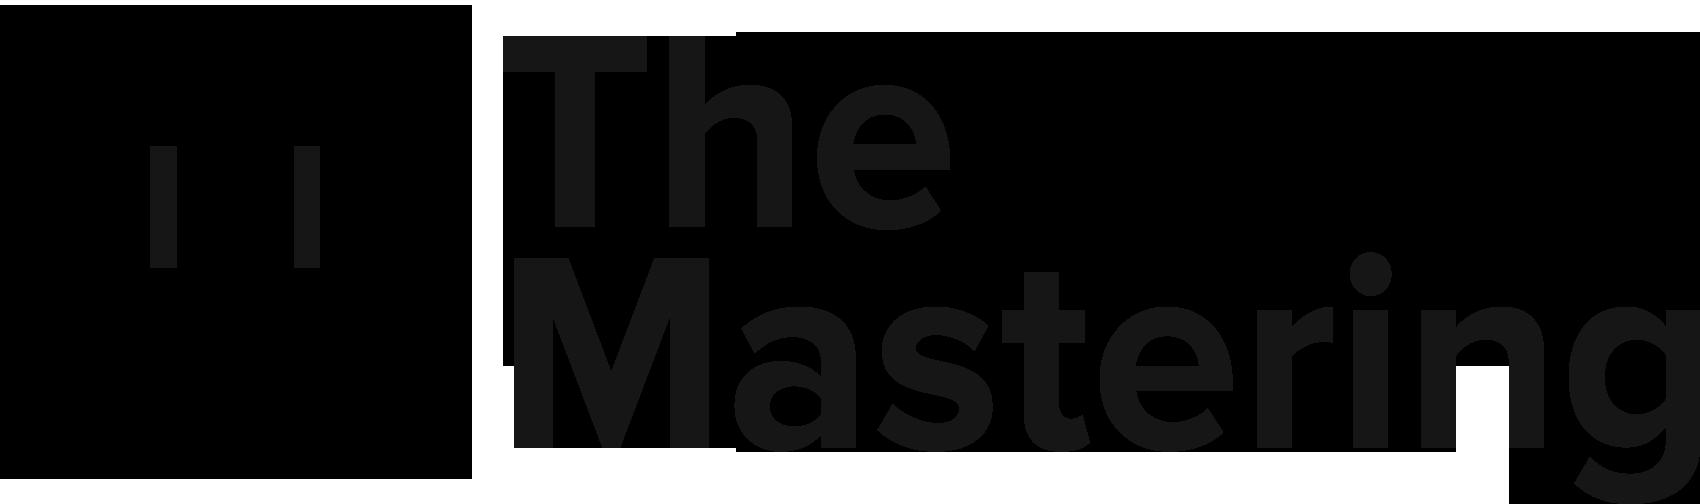 The Fat Mastering - Logo